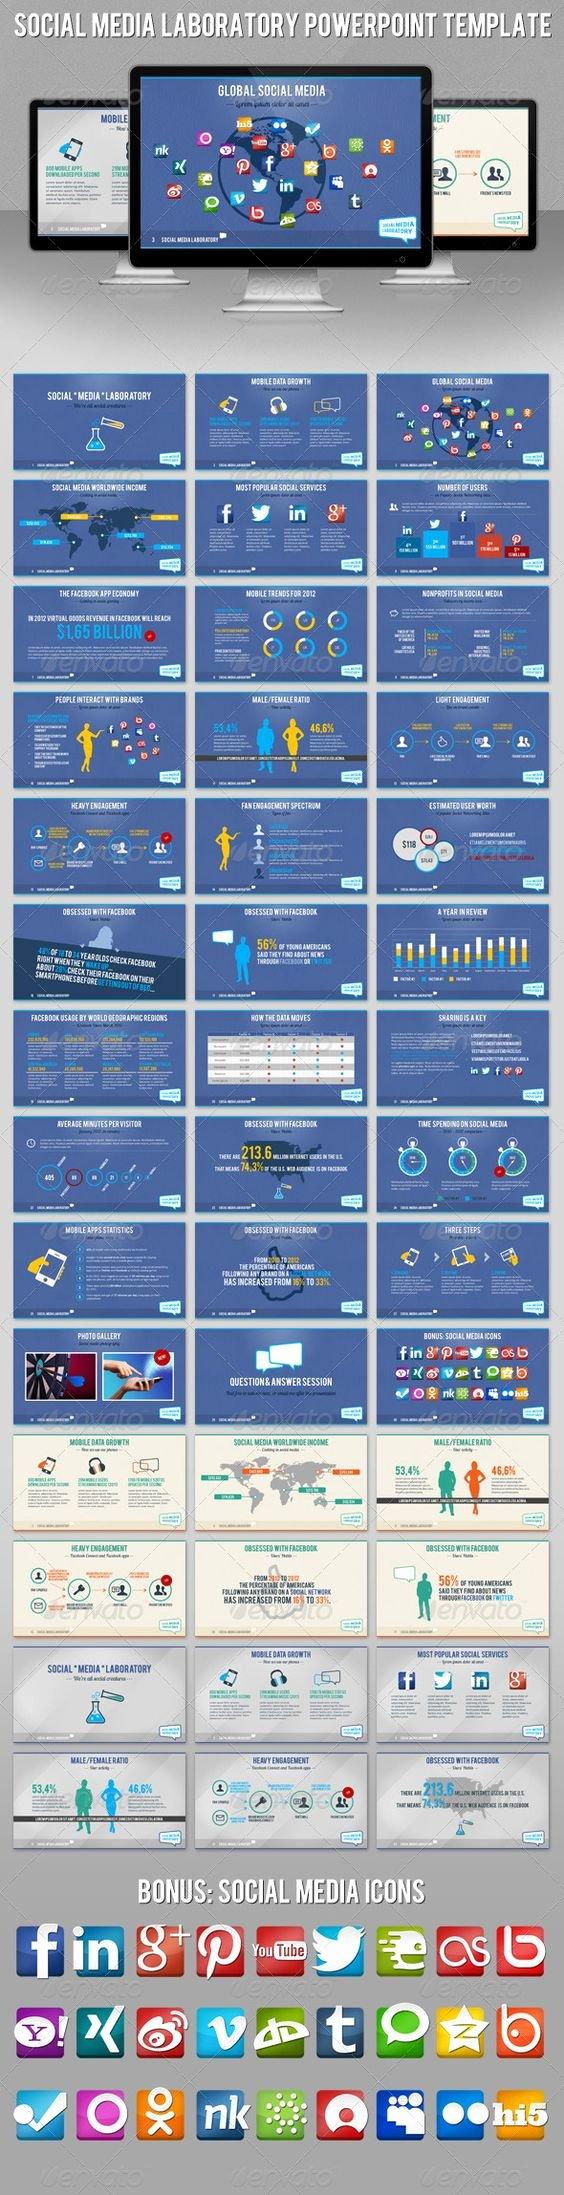 Social Media Powerpoint Template Best Of social Media Laboratory Hd Powerpoint Template